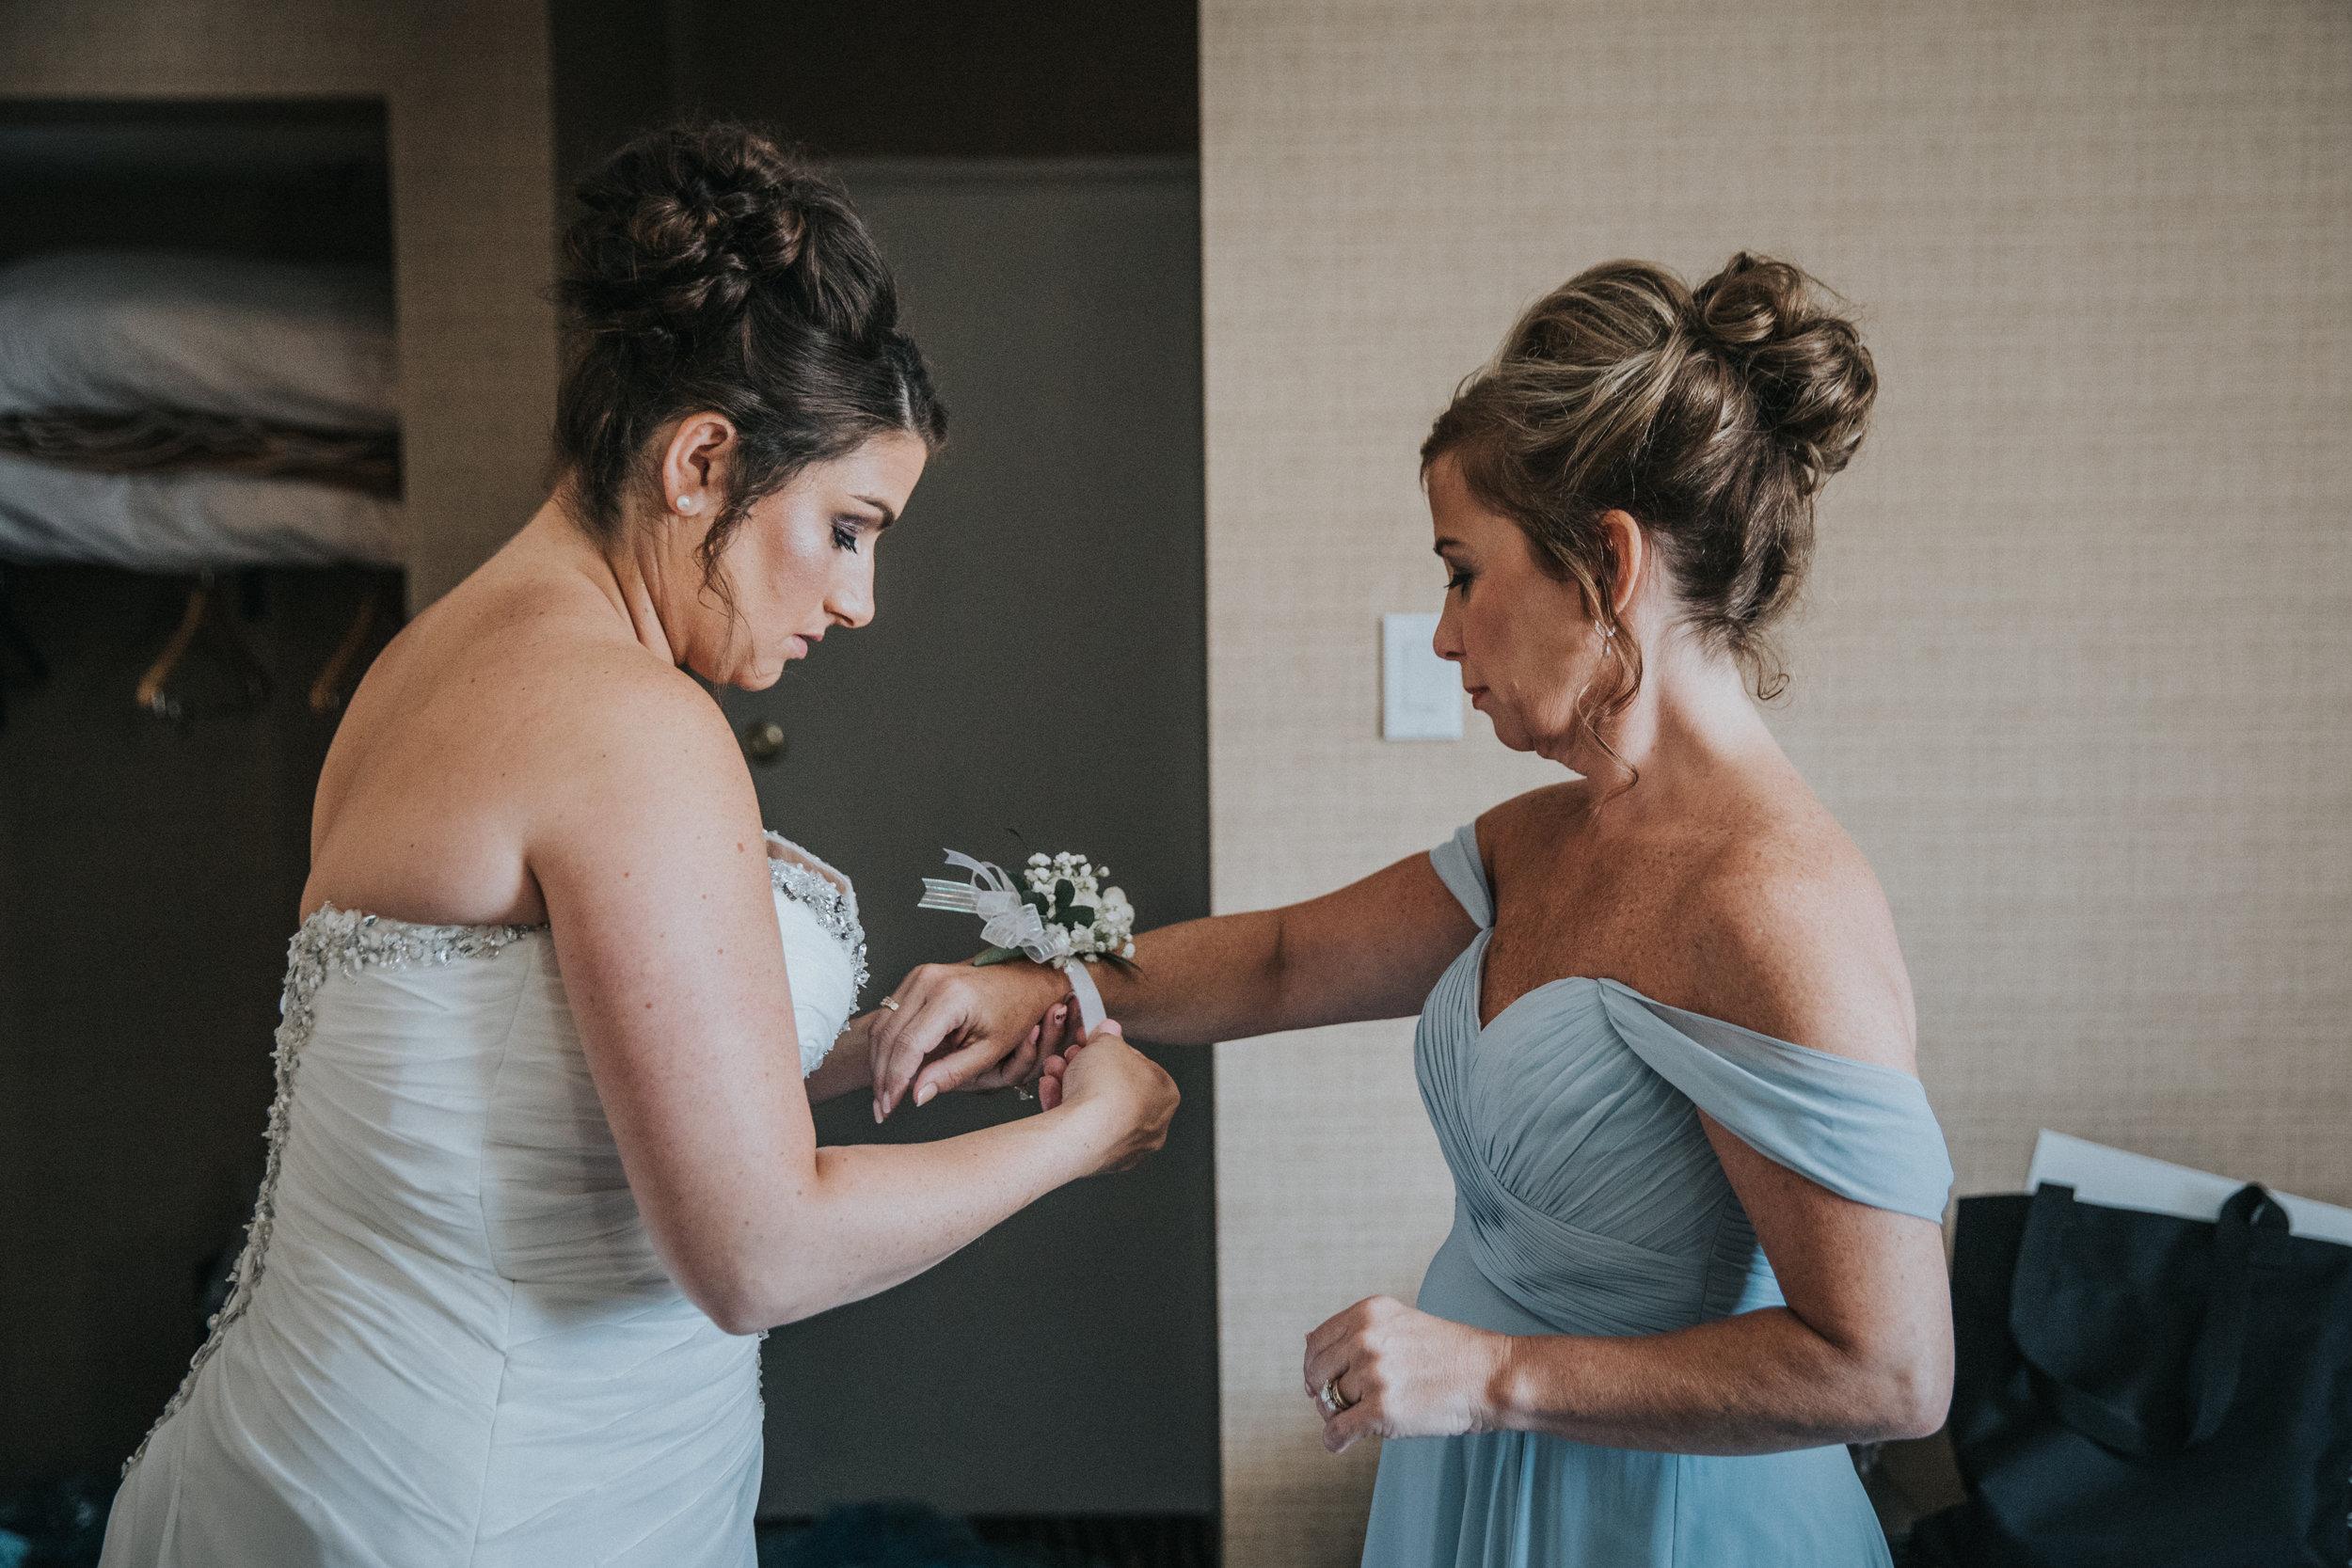 JennaLynnPhotography-NJWeddingPhotographer-Wedding-TheBerkeley-AsburyPark-Allison&Michael-GettingReady-79.jpg